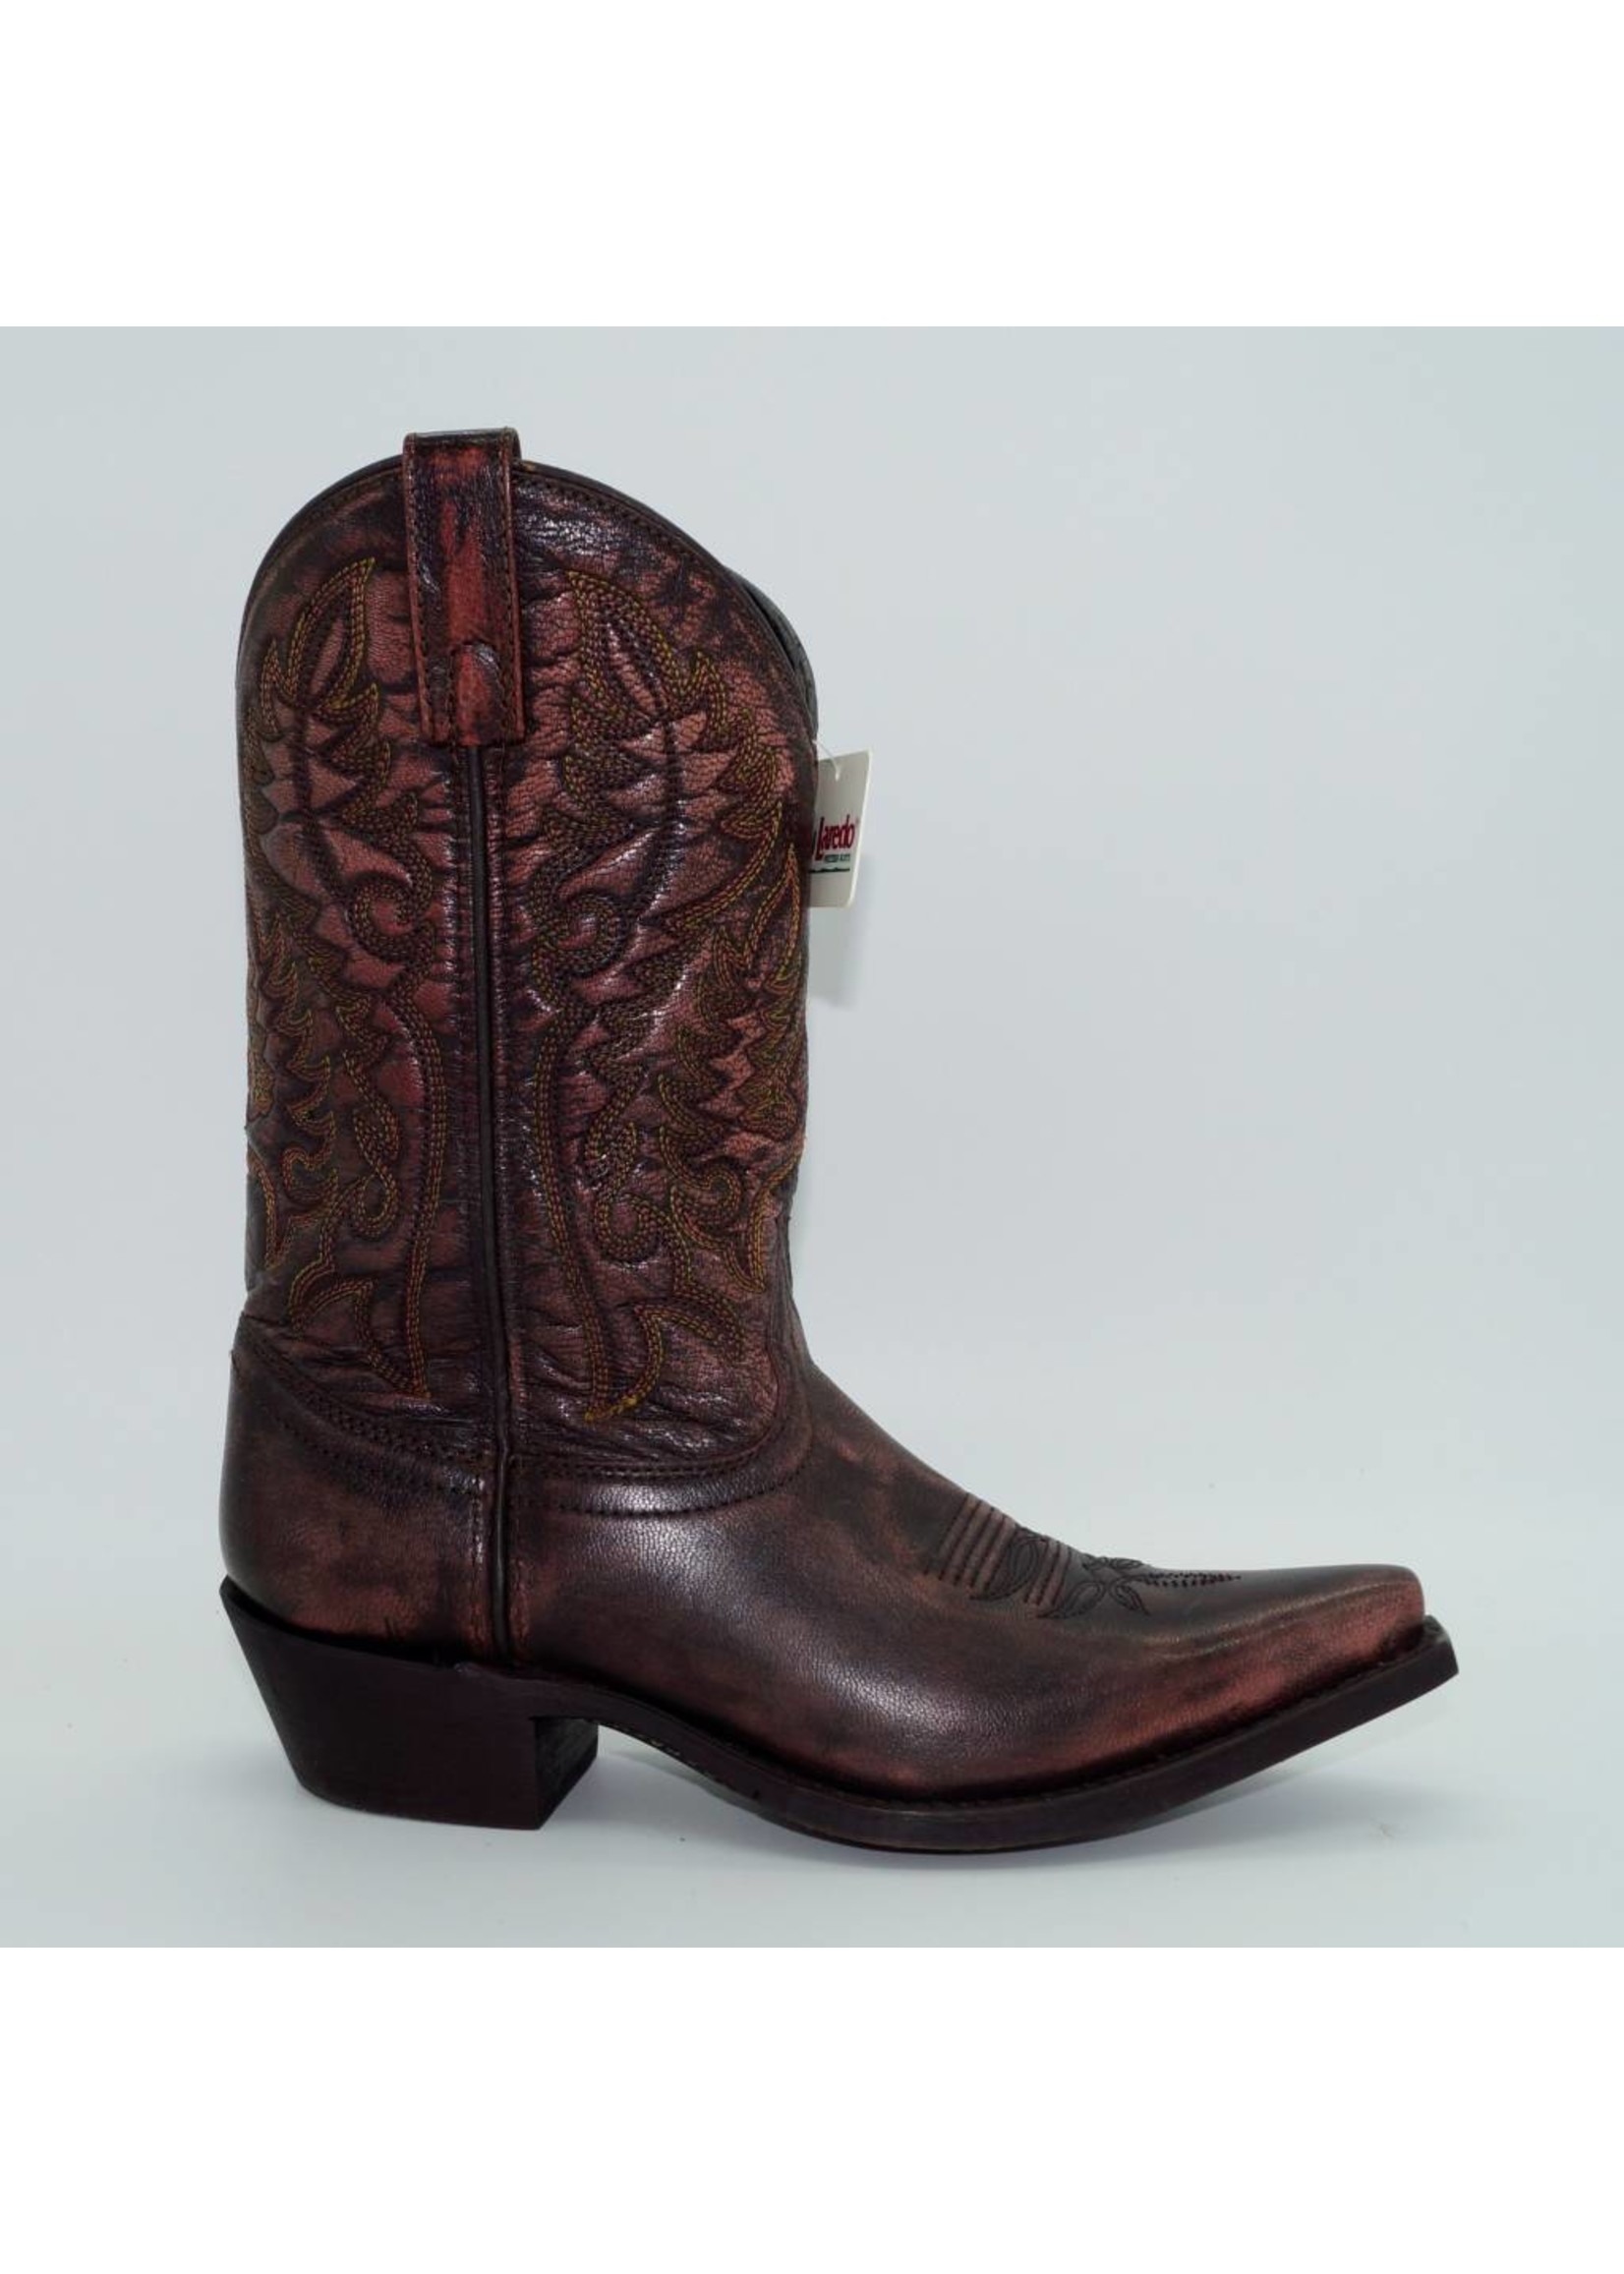 Laredo Women's Distressed Brown Western Boots 5108